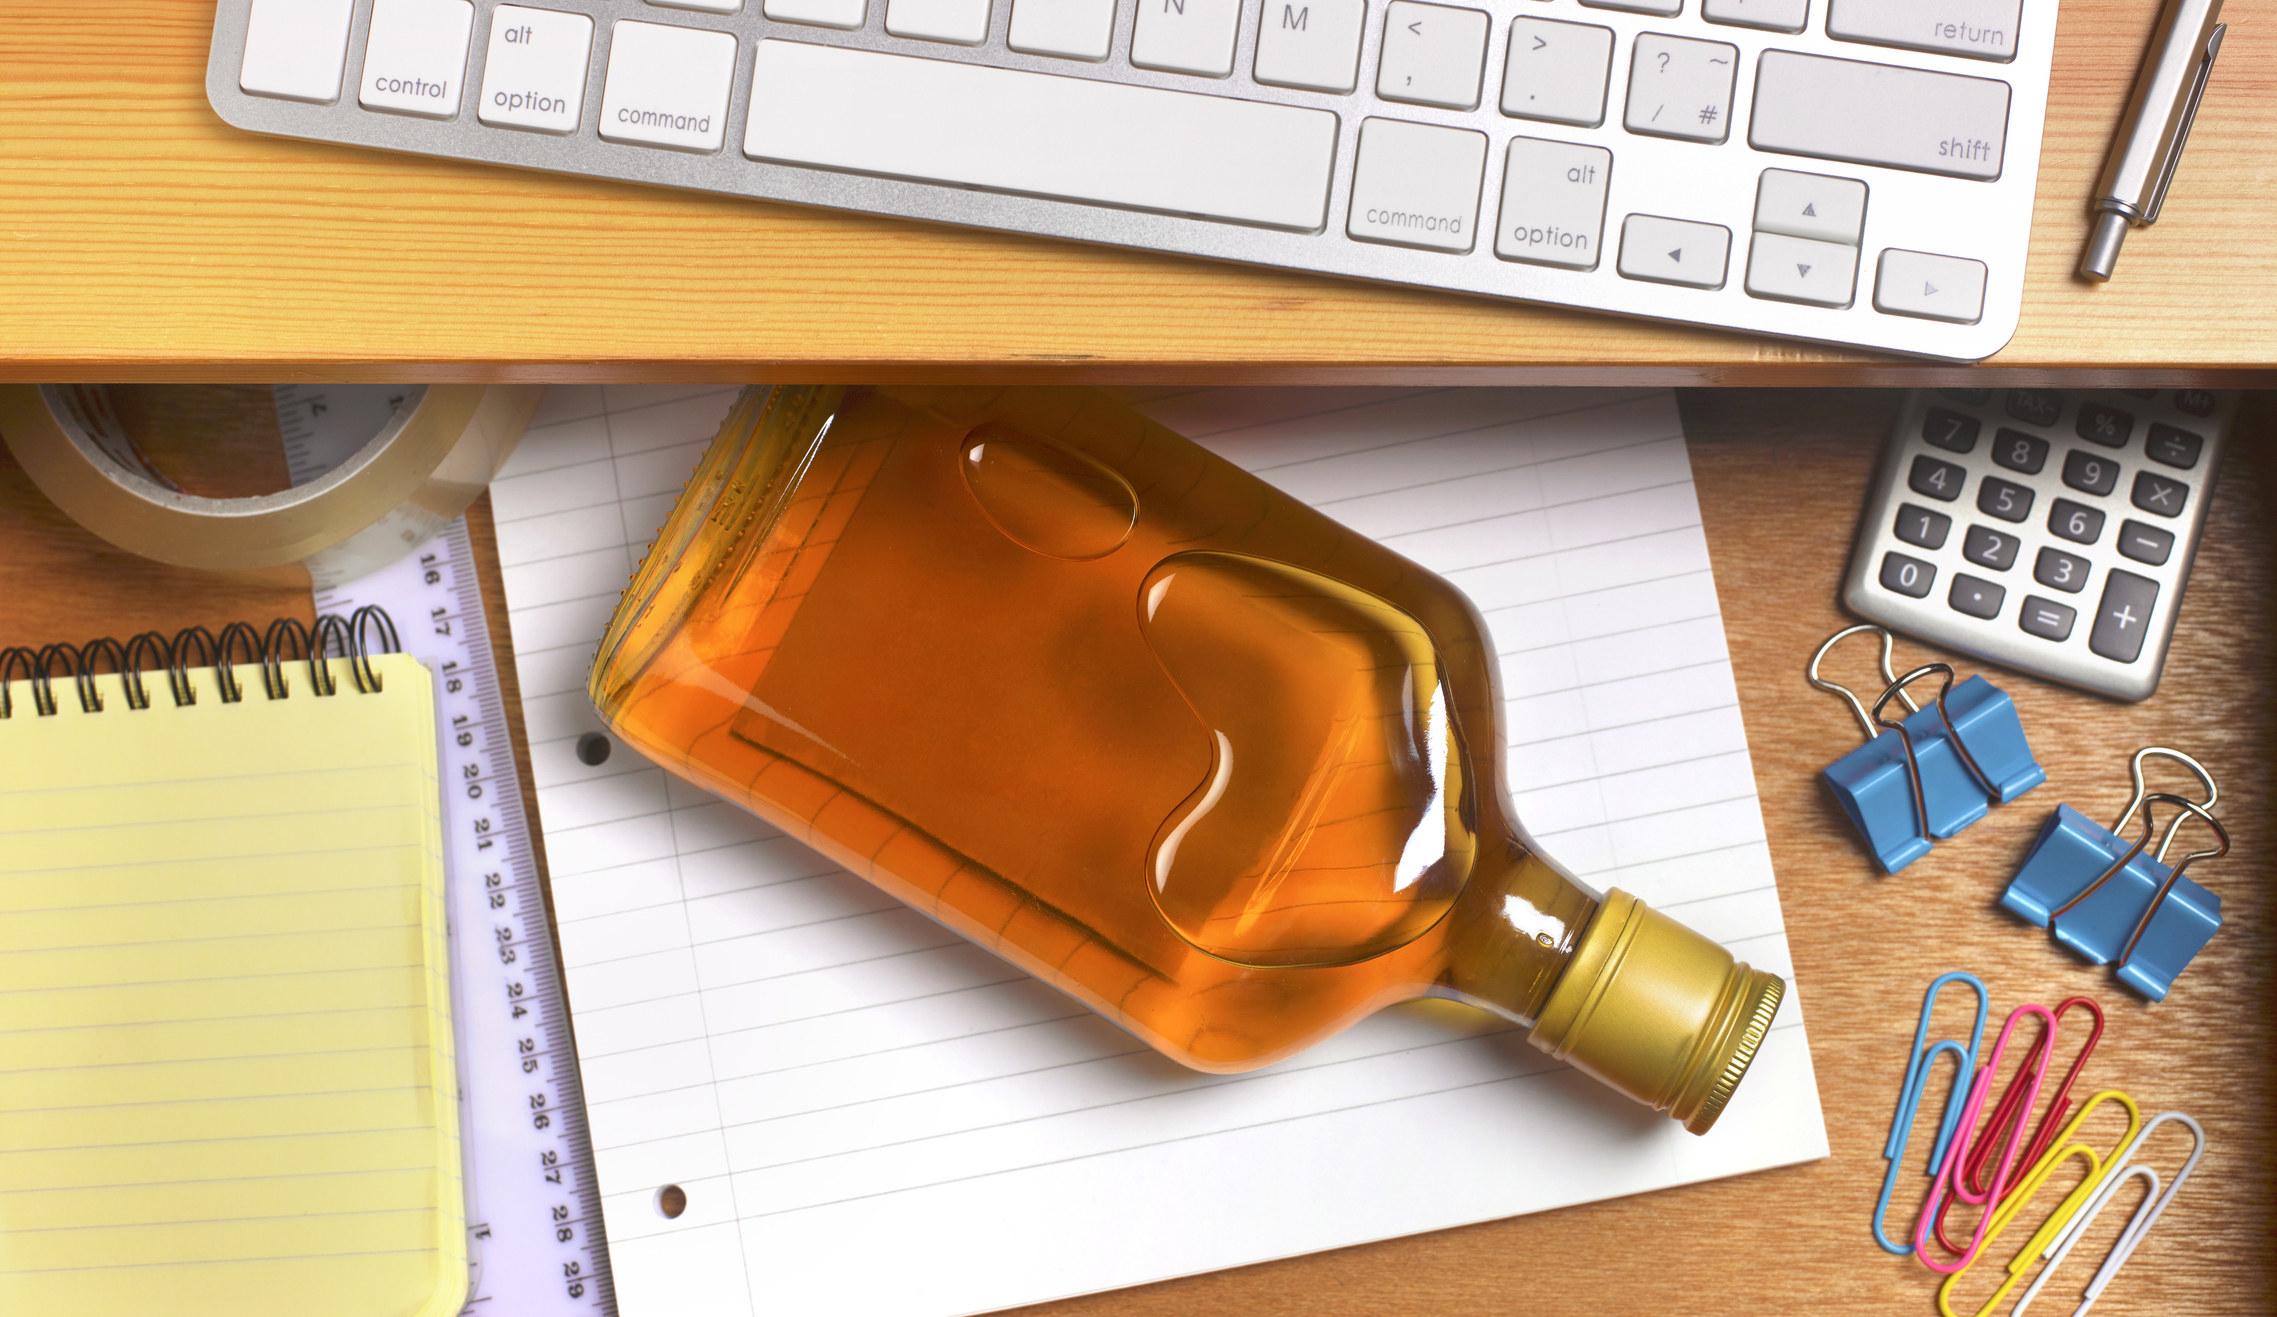 A liquor bottle in a desk drawer